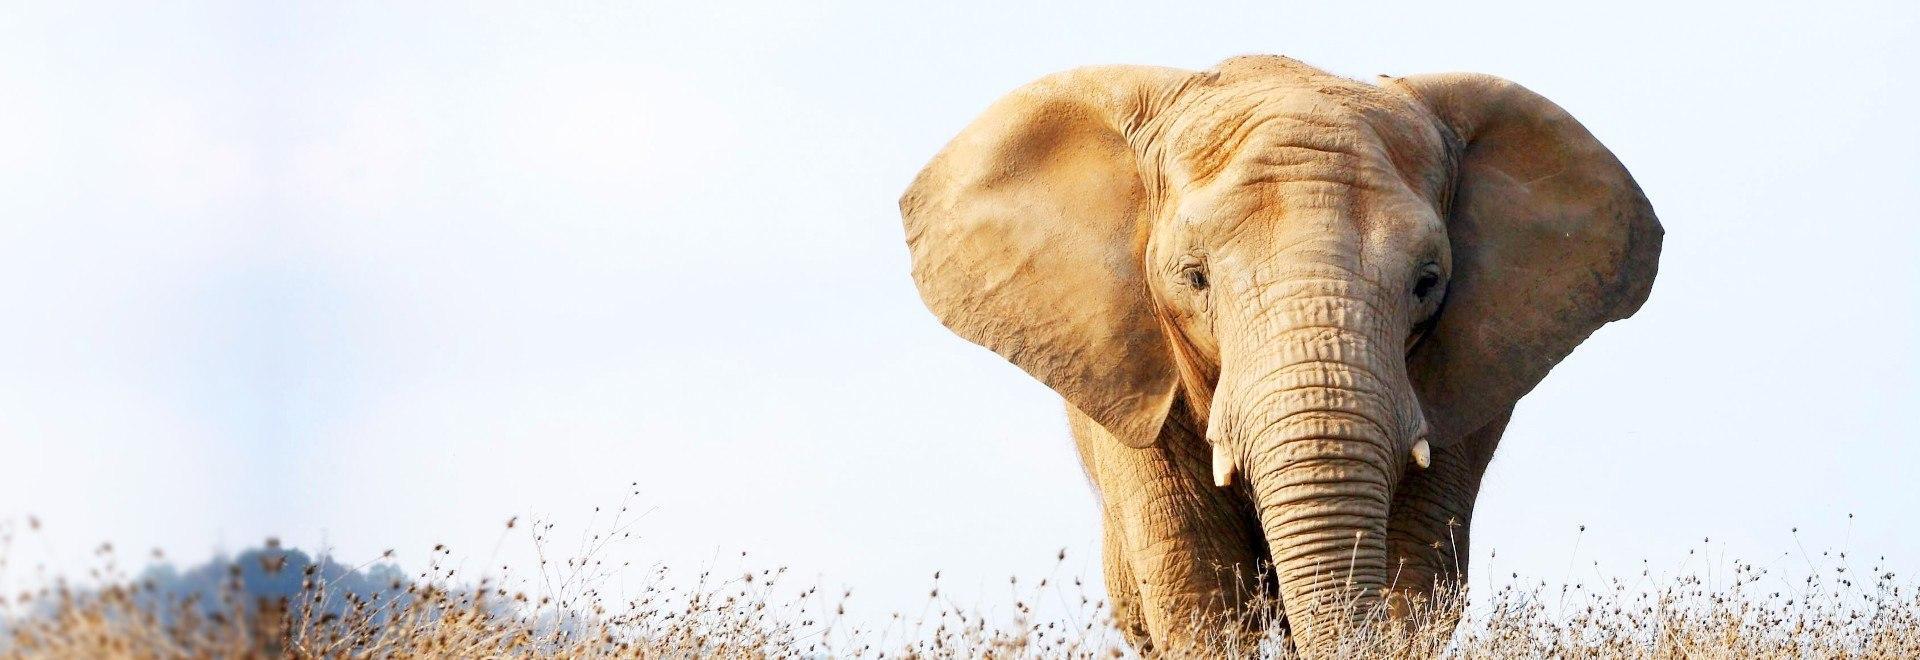 Elefanti - Una specie da salvare